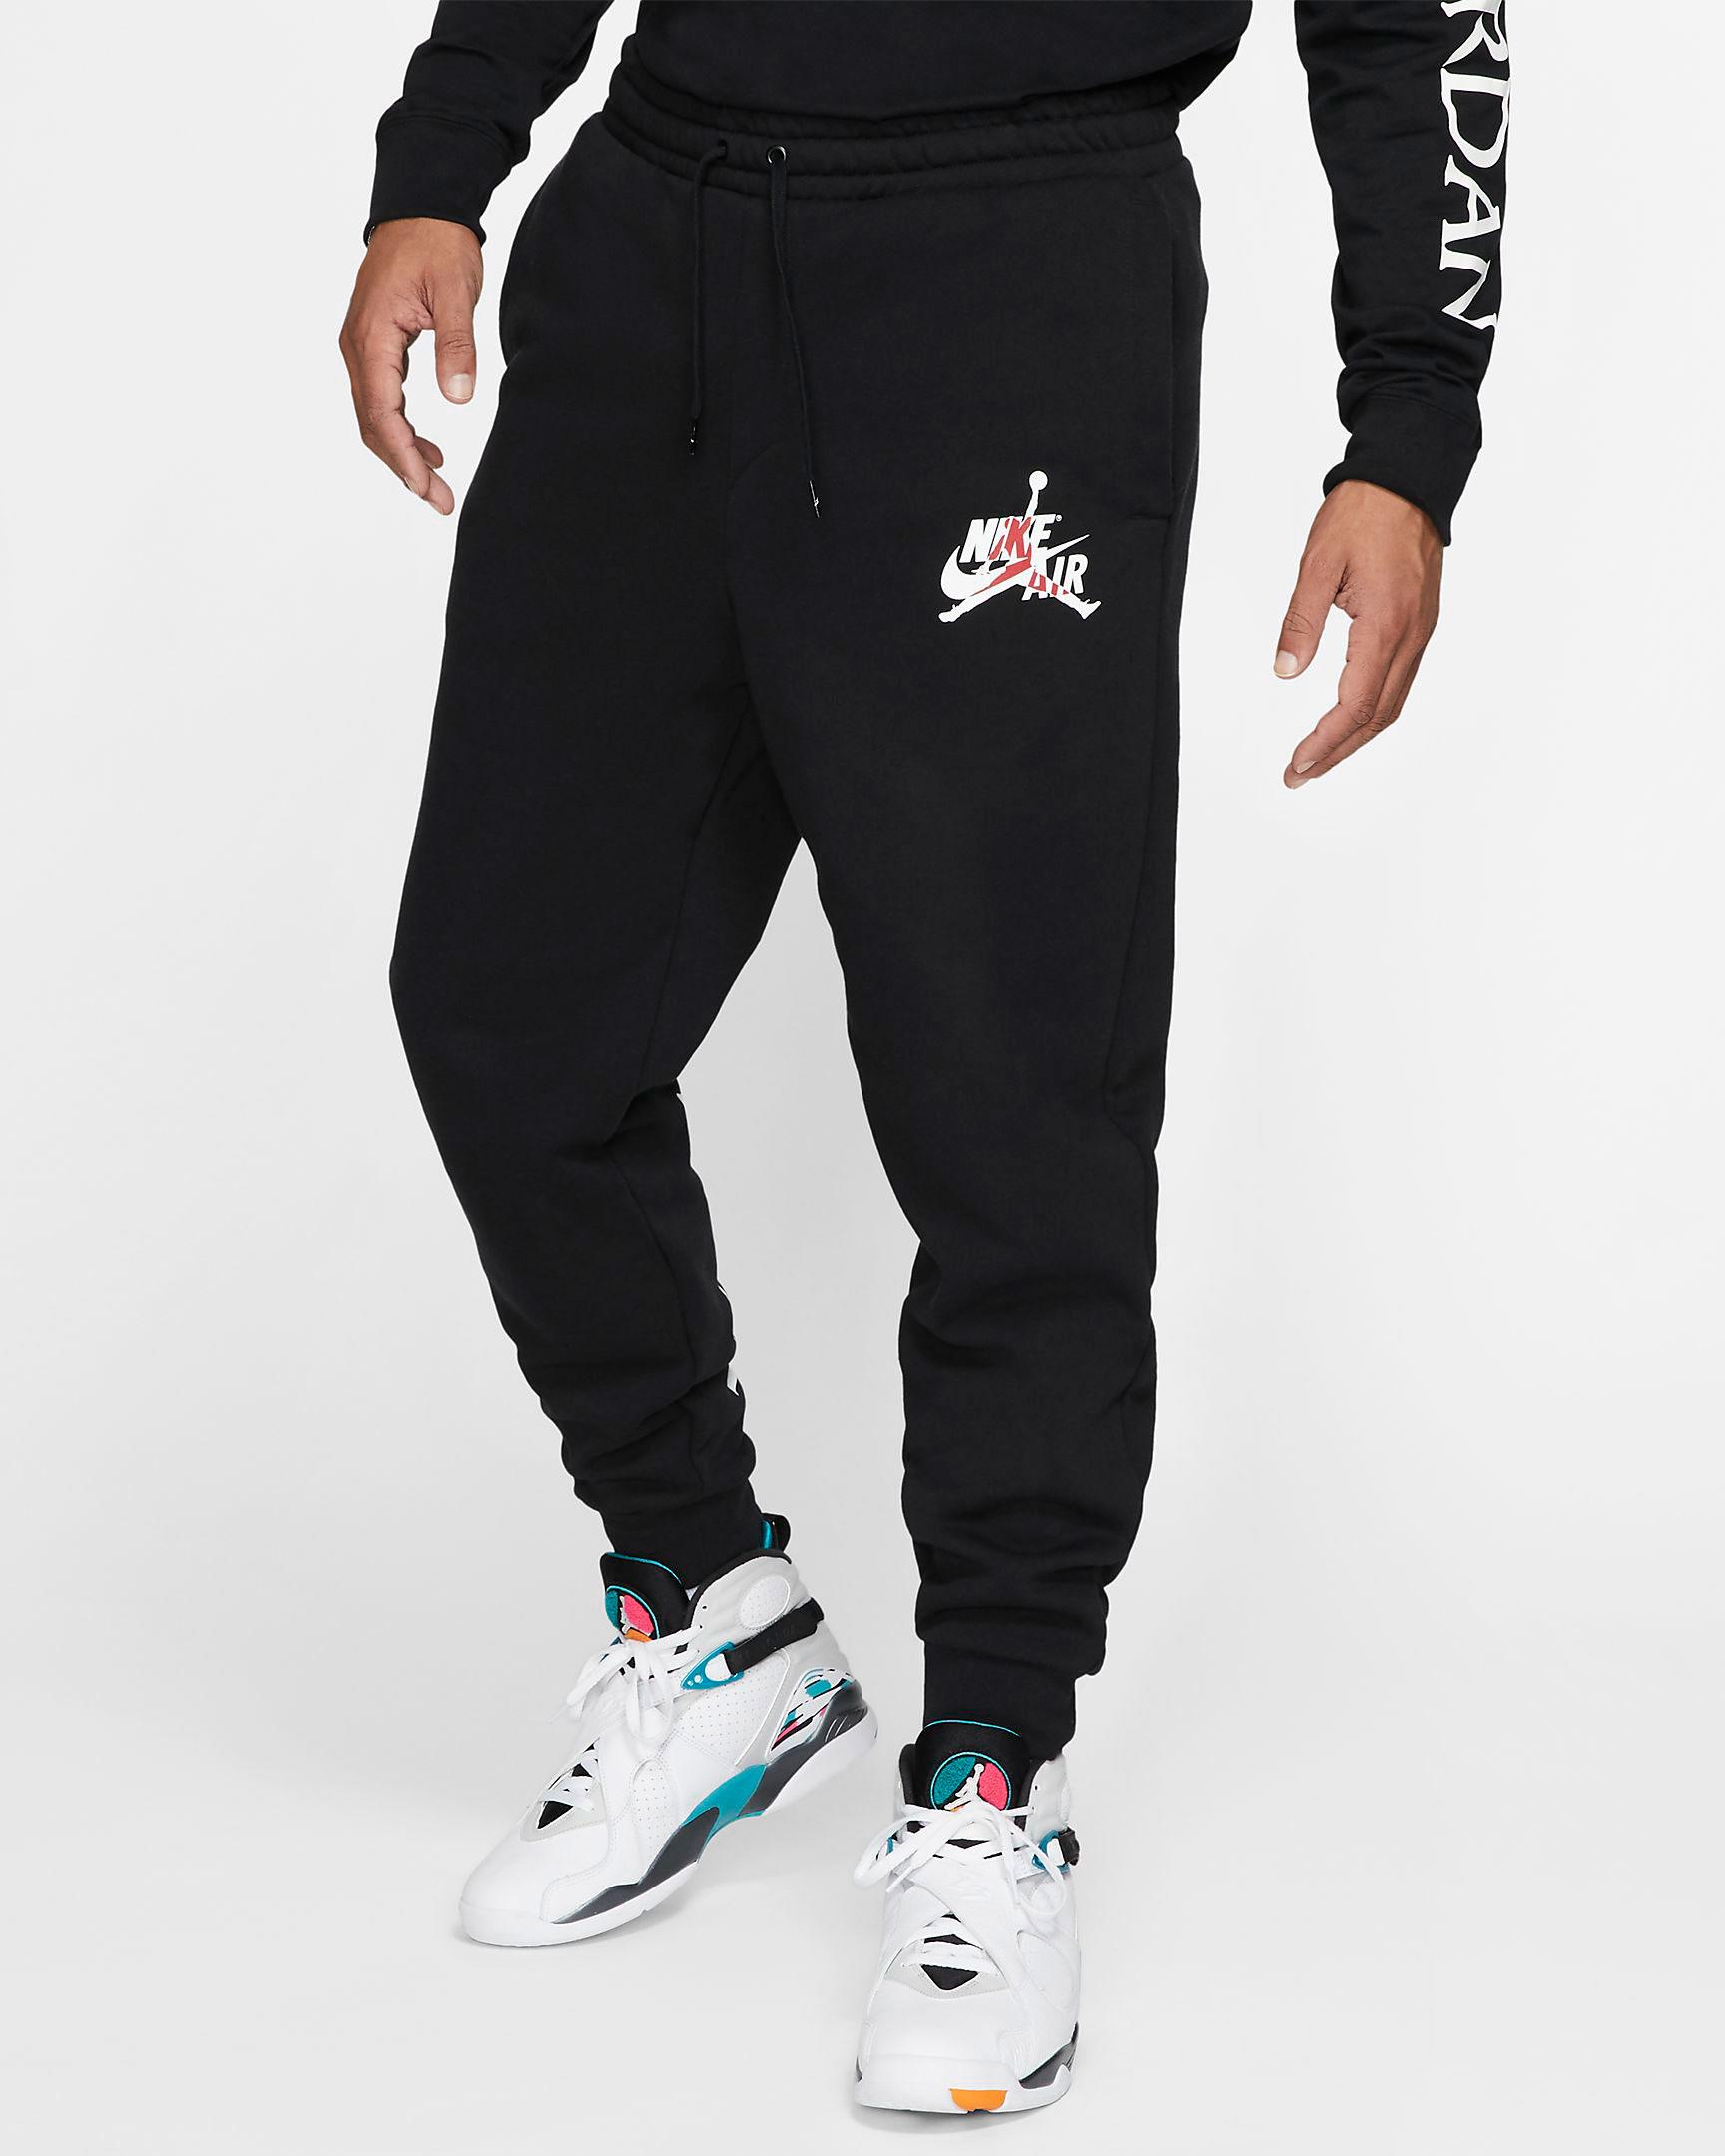 air-jordan-1-high-gym-red-black-jogger-pants-1